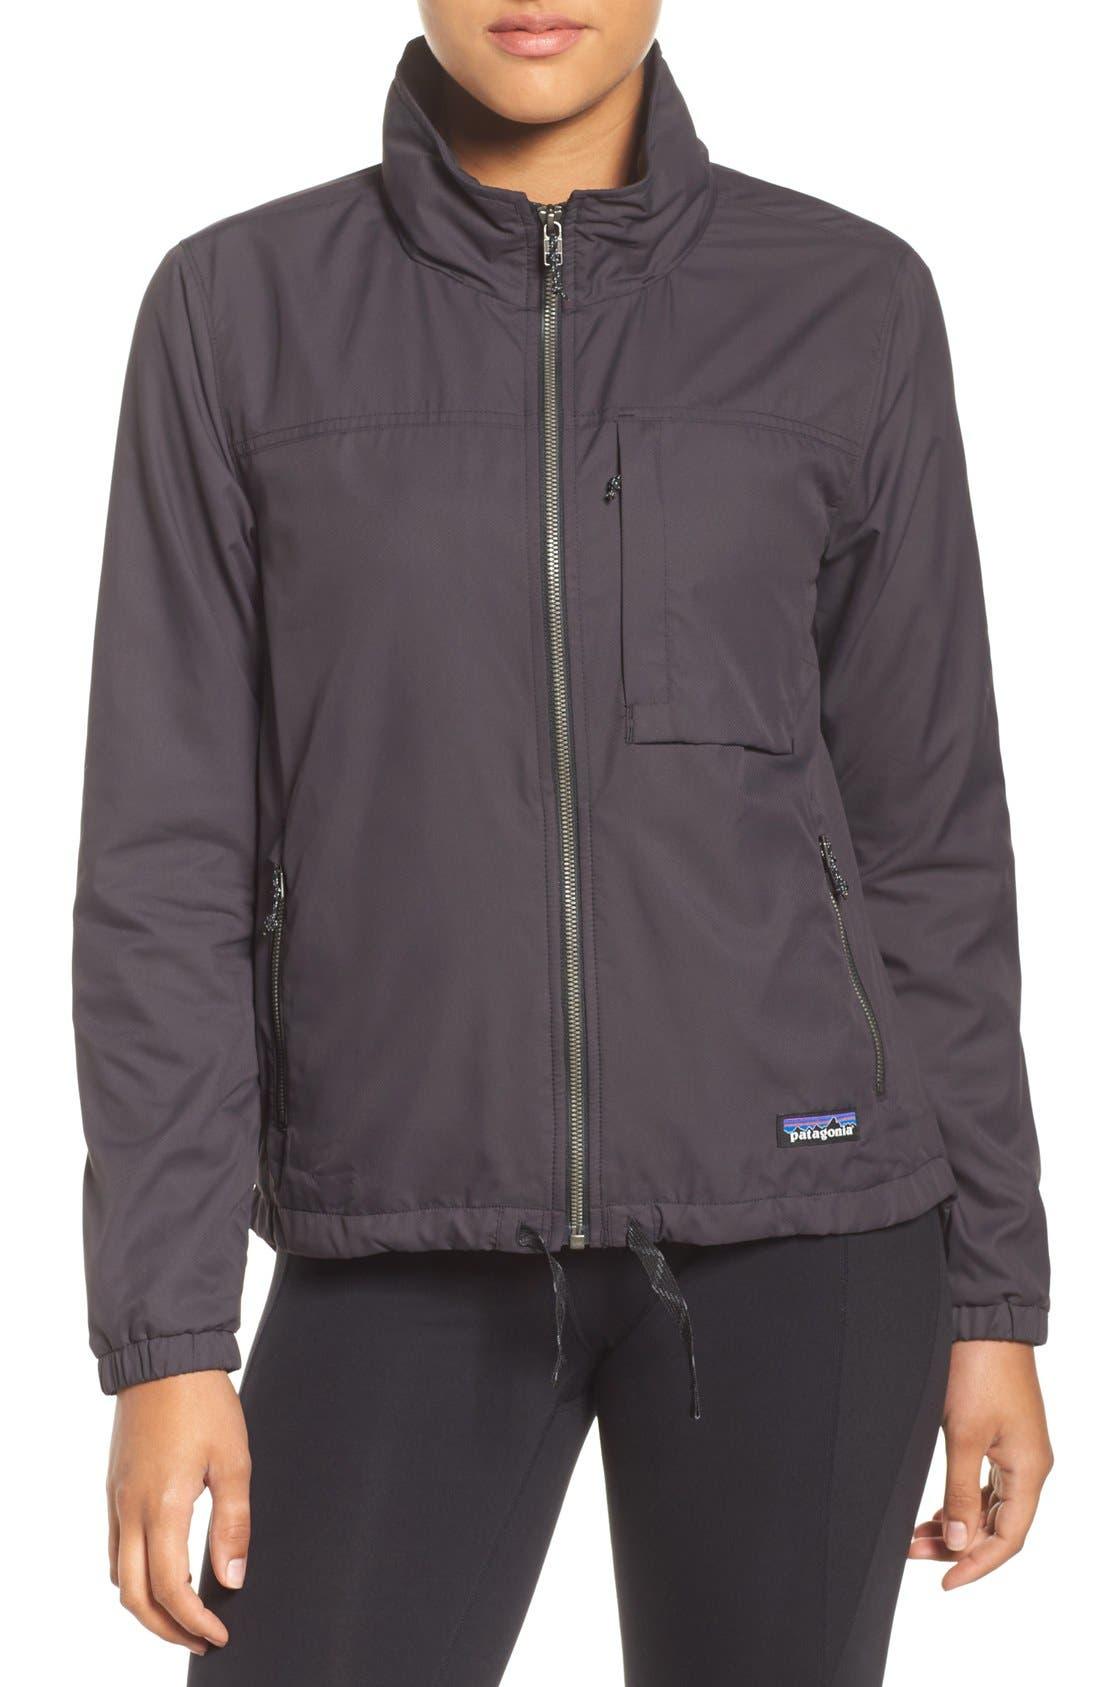 Mountain View Windbreaker Jacket,                             Main thumbnail 1, color,                             Ink Black